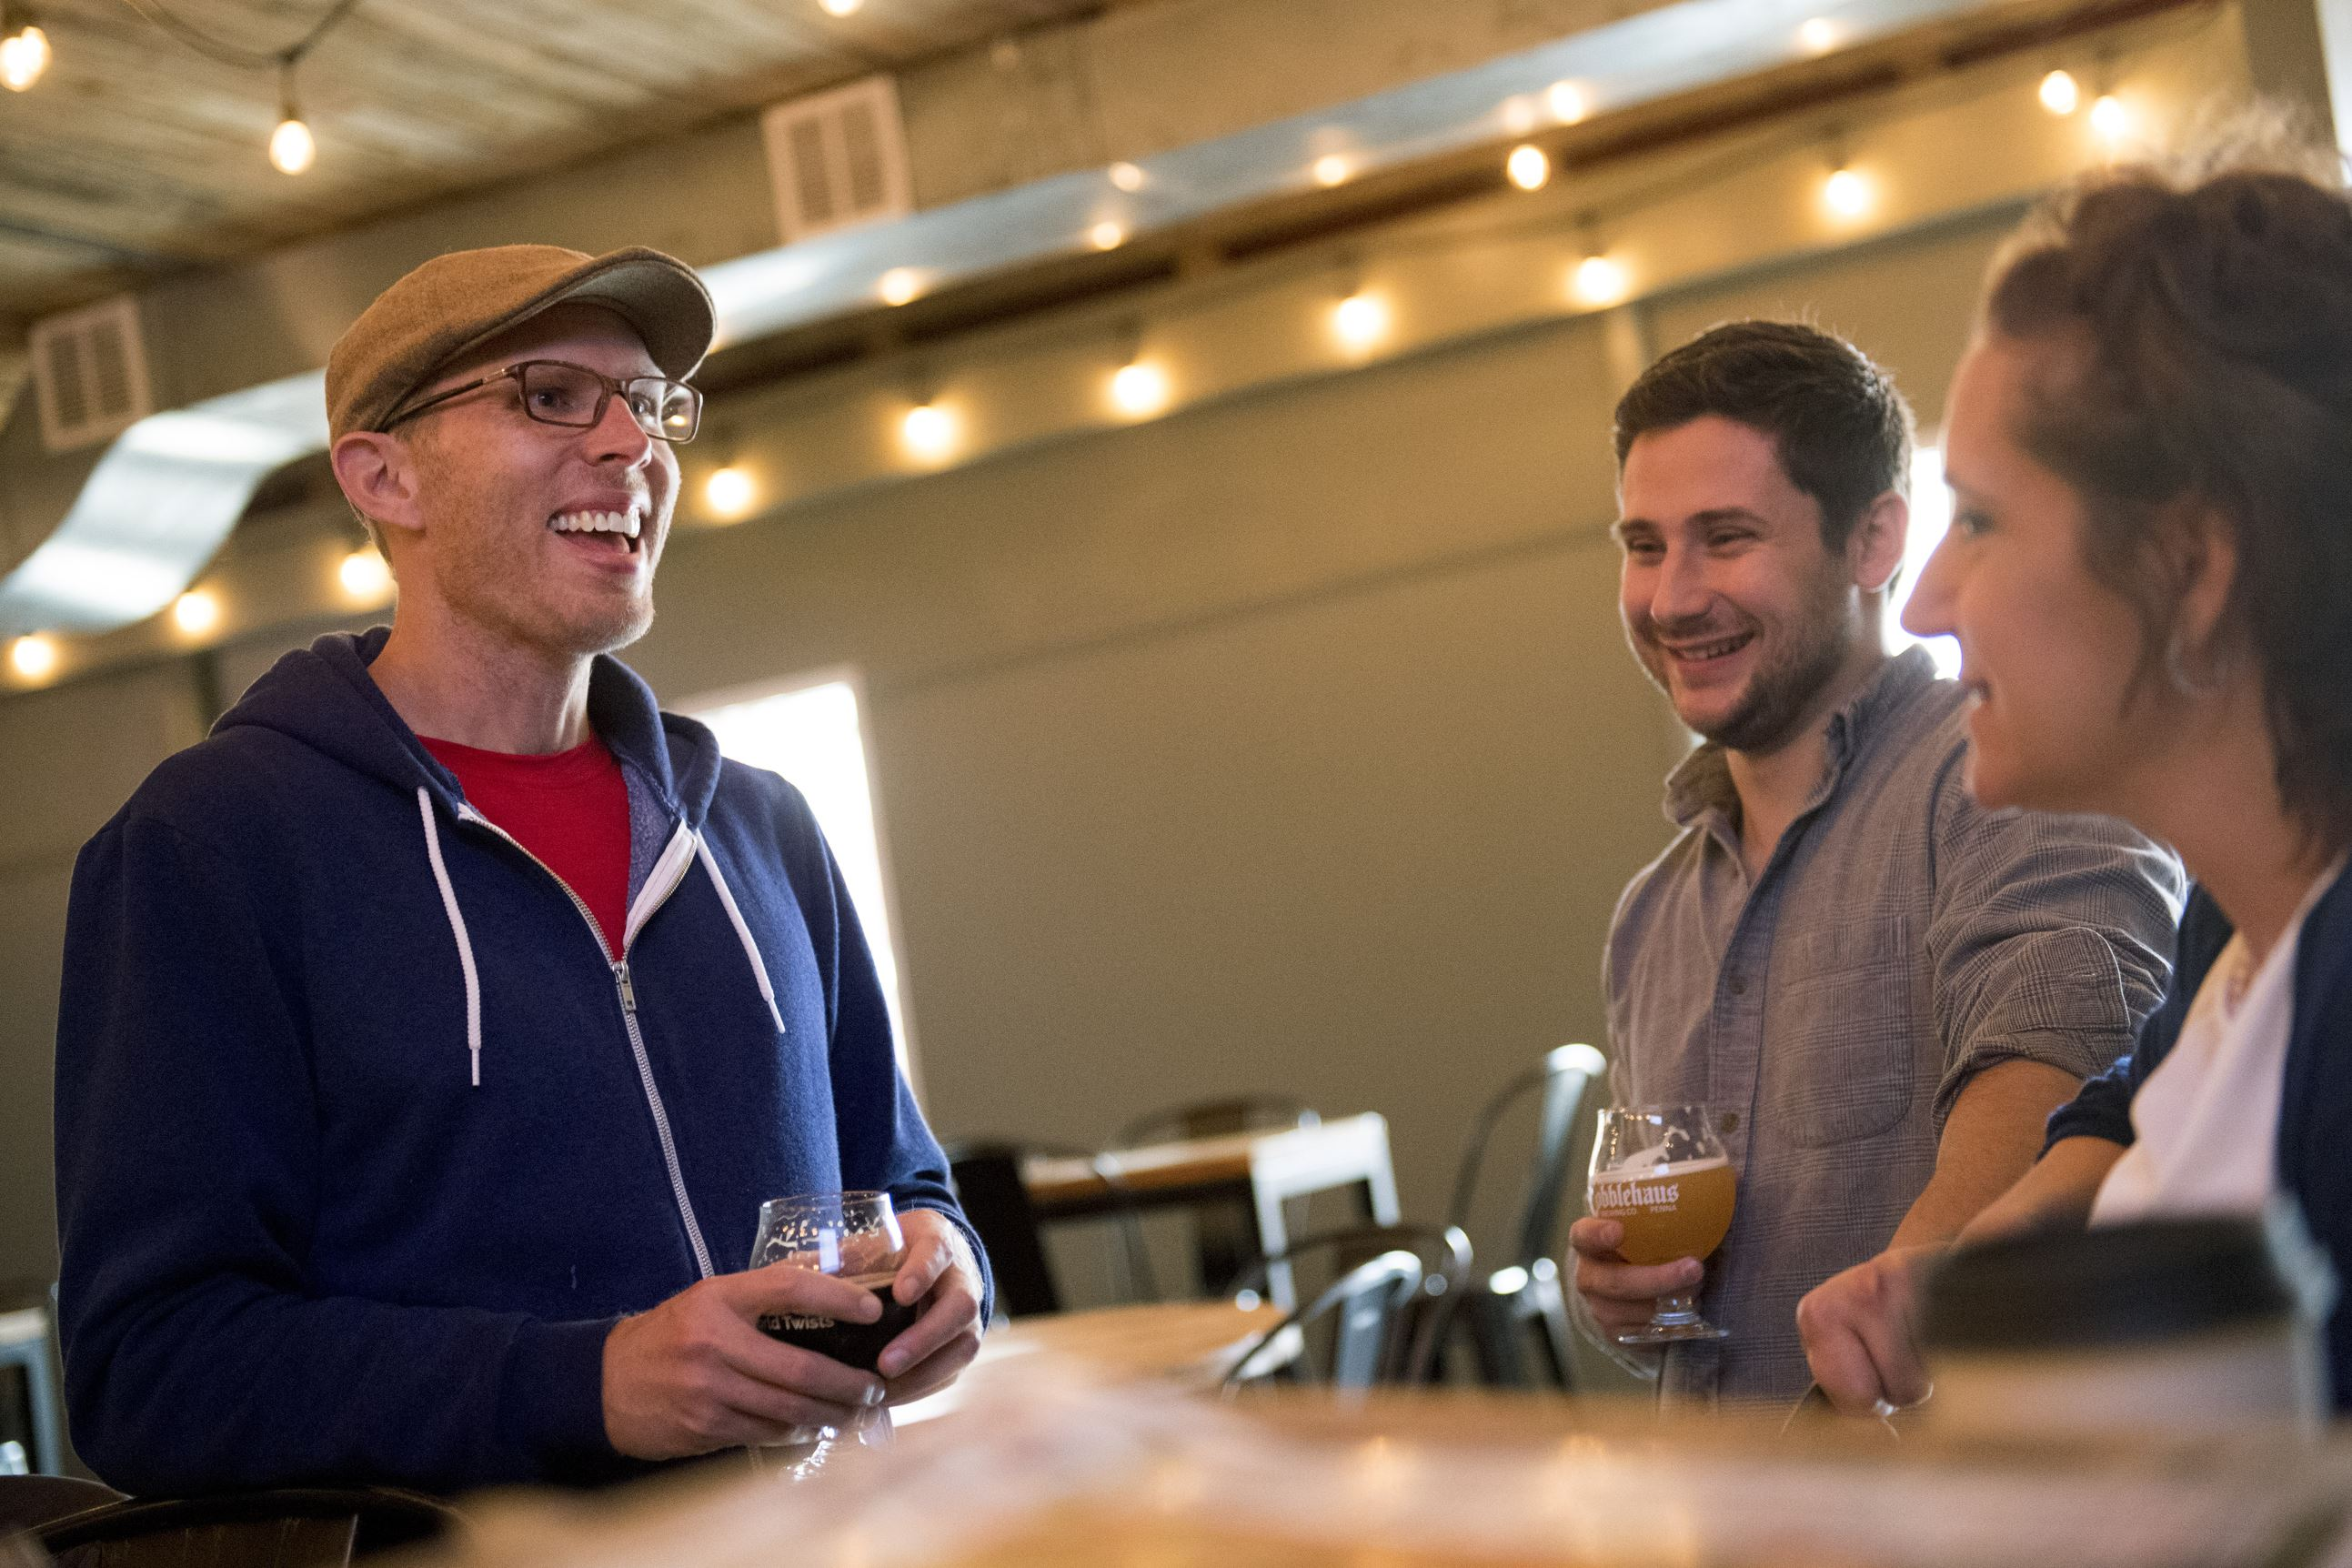 20170505scCobblehaus-02-4 Dane Vandenberg, Ryan Singer and Janet Mills enjoy beer on Saturday, May 6, 2017 at Cobblehaus Brewing Company in Coraopolis. (Steph Chambers/Post-Gazette)